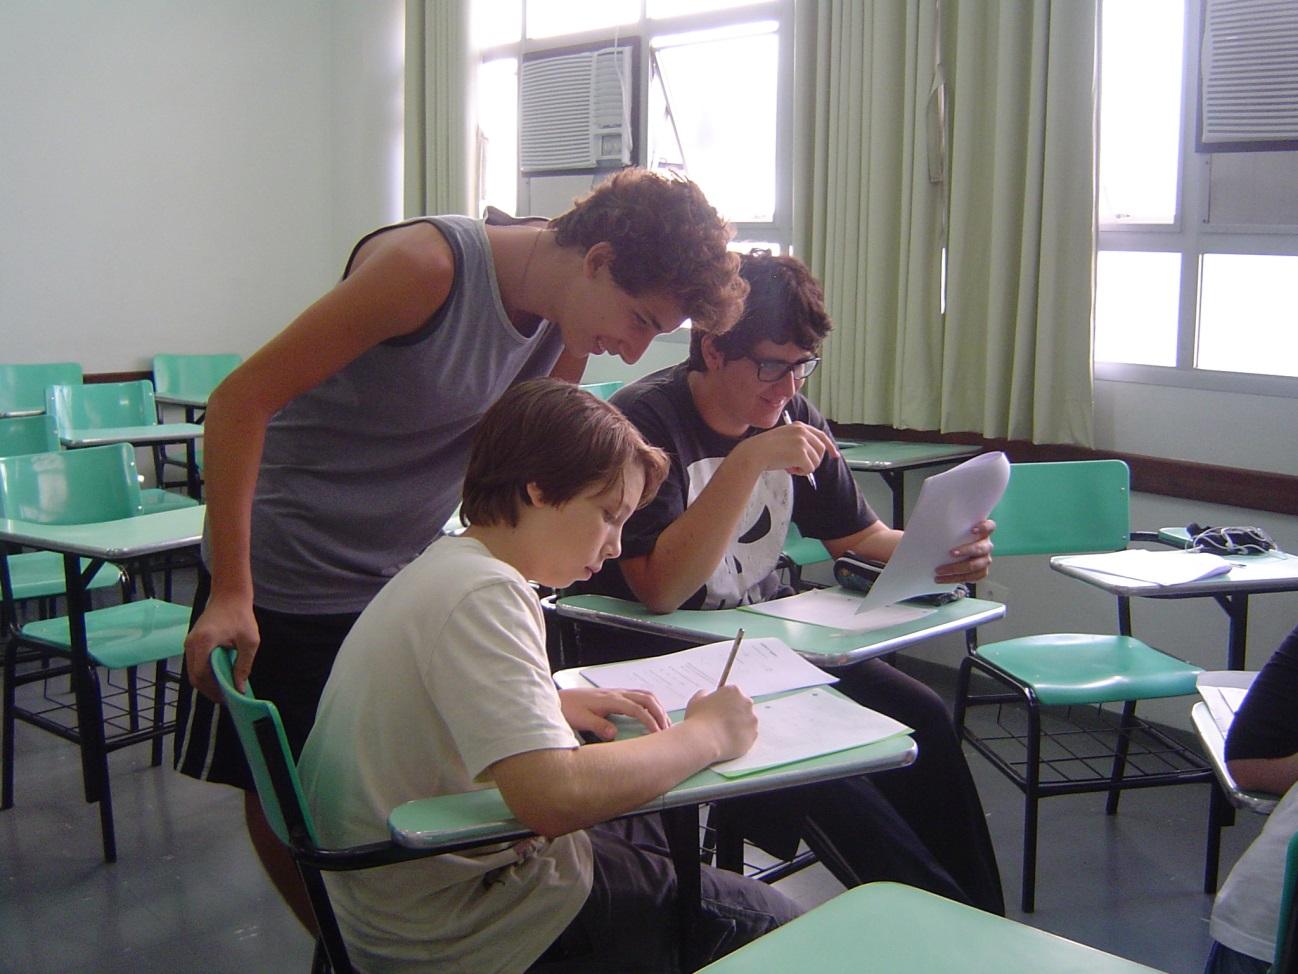 orientacoes_de_estudo_de_matematica_no_curriculo_da_1_serie_003